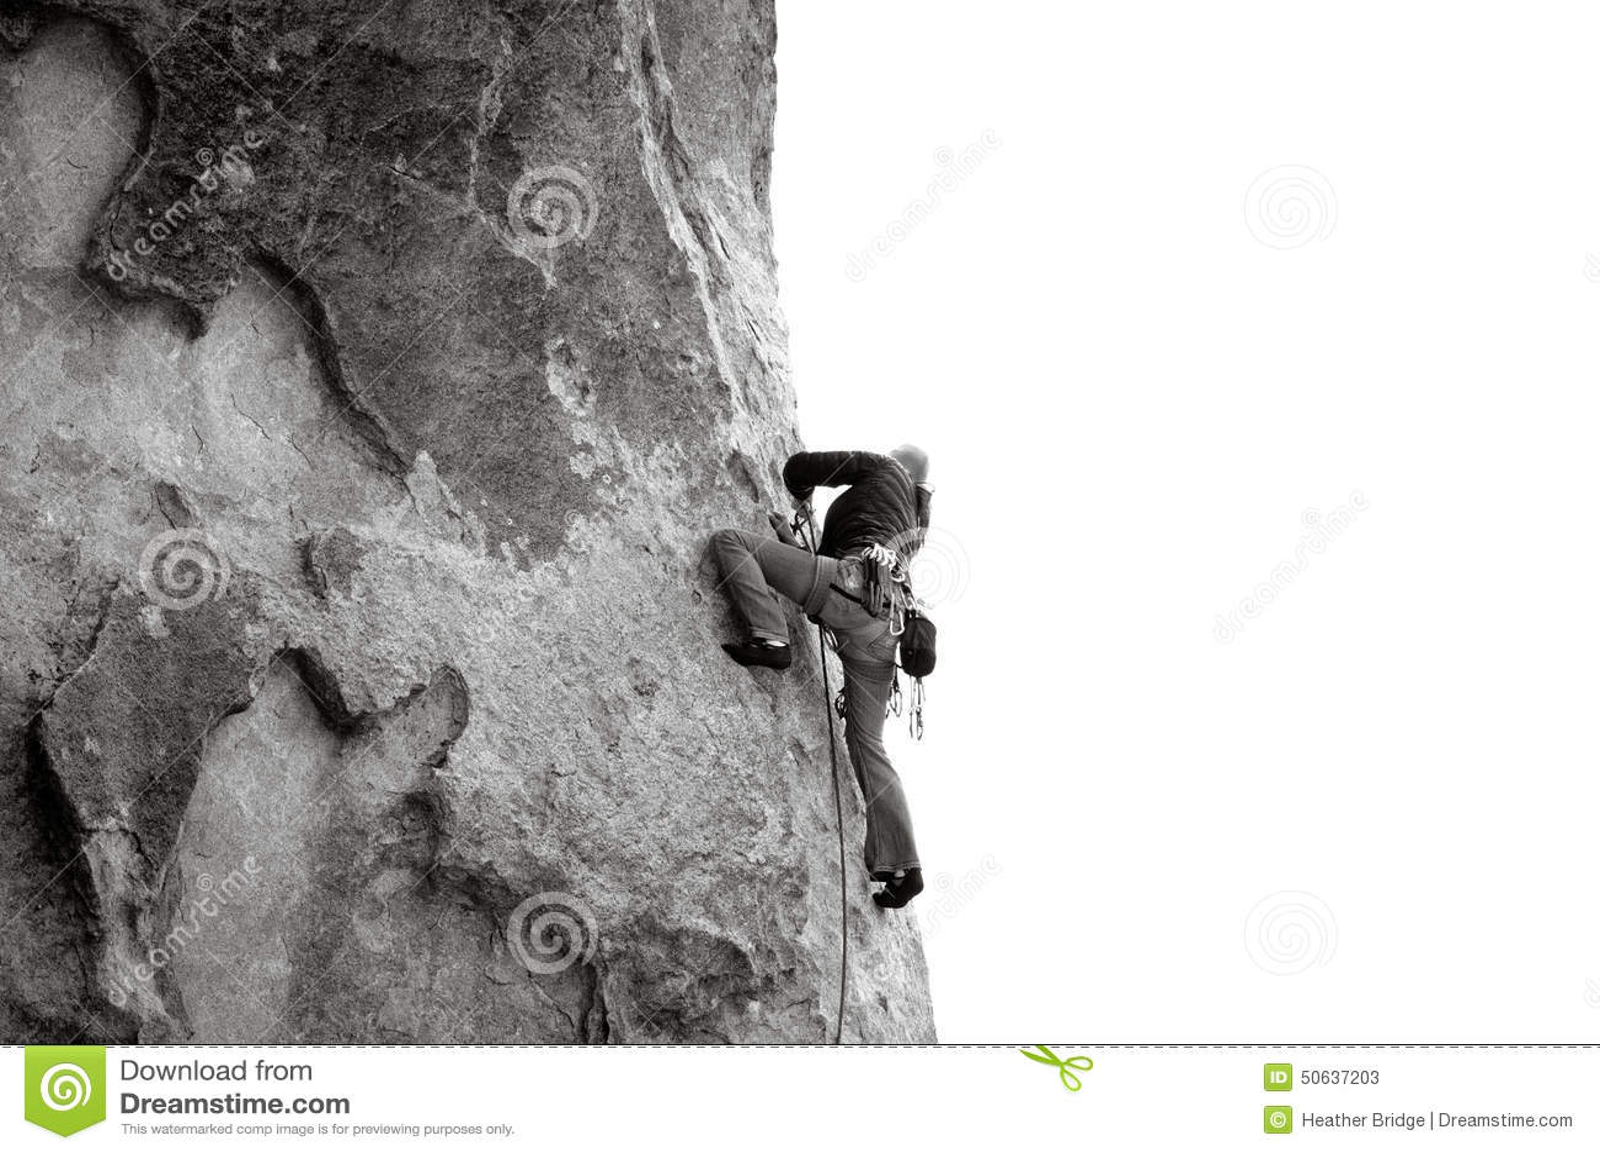 La roche s élevante de noeuds ropes deux